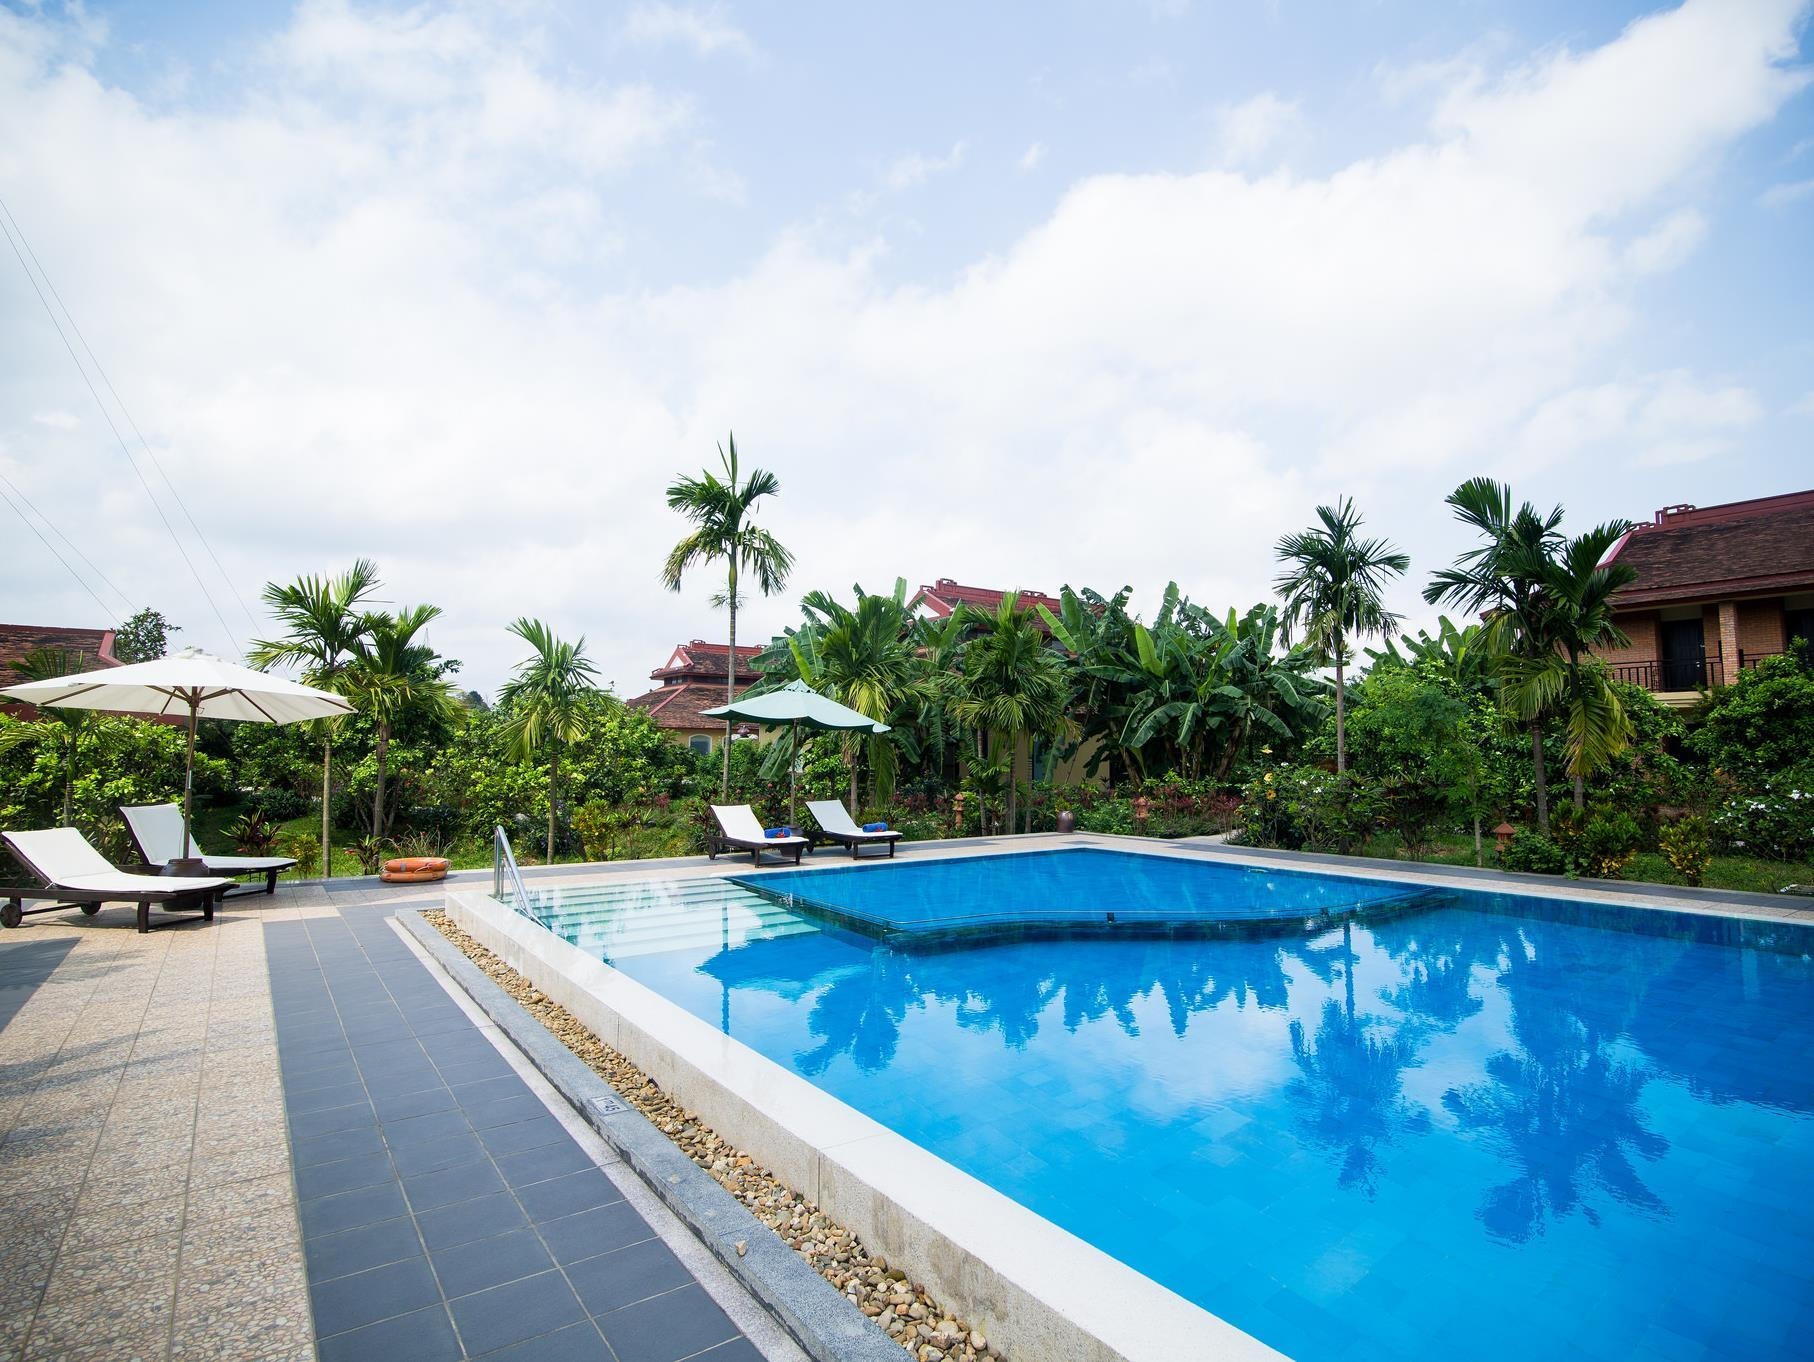 Hue Riverside Boutique Resort And Spa